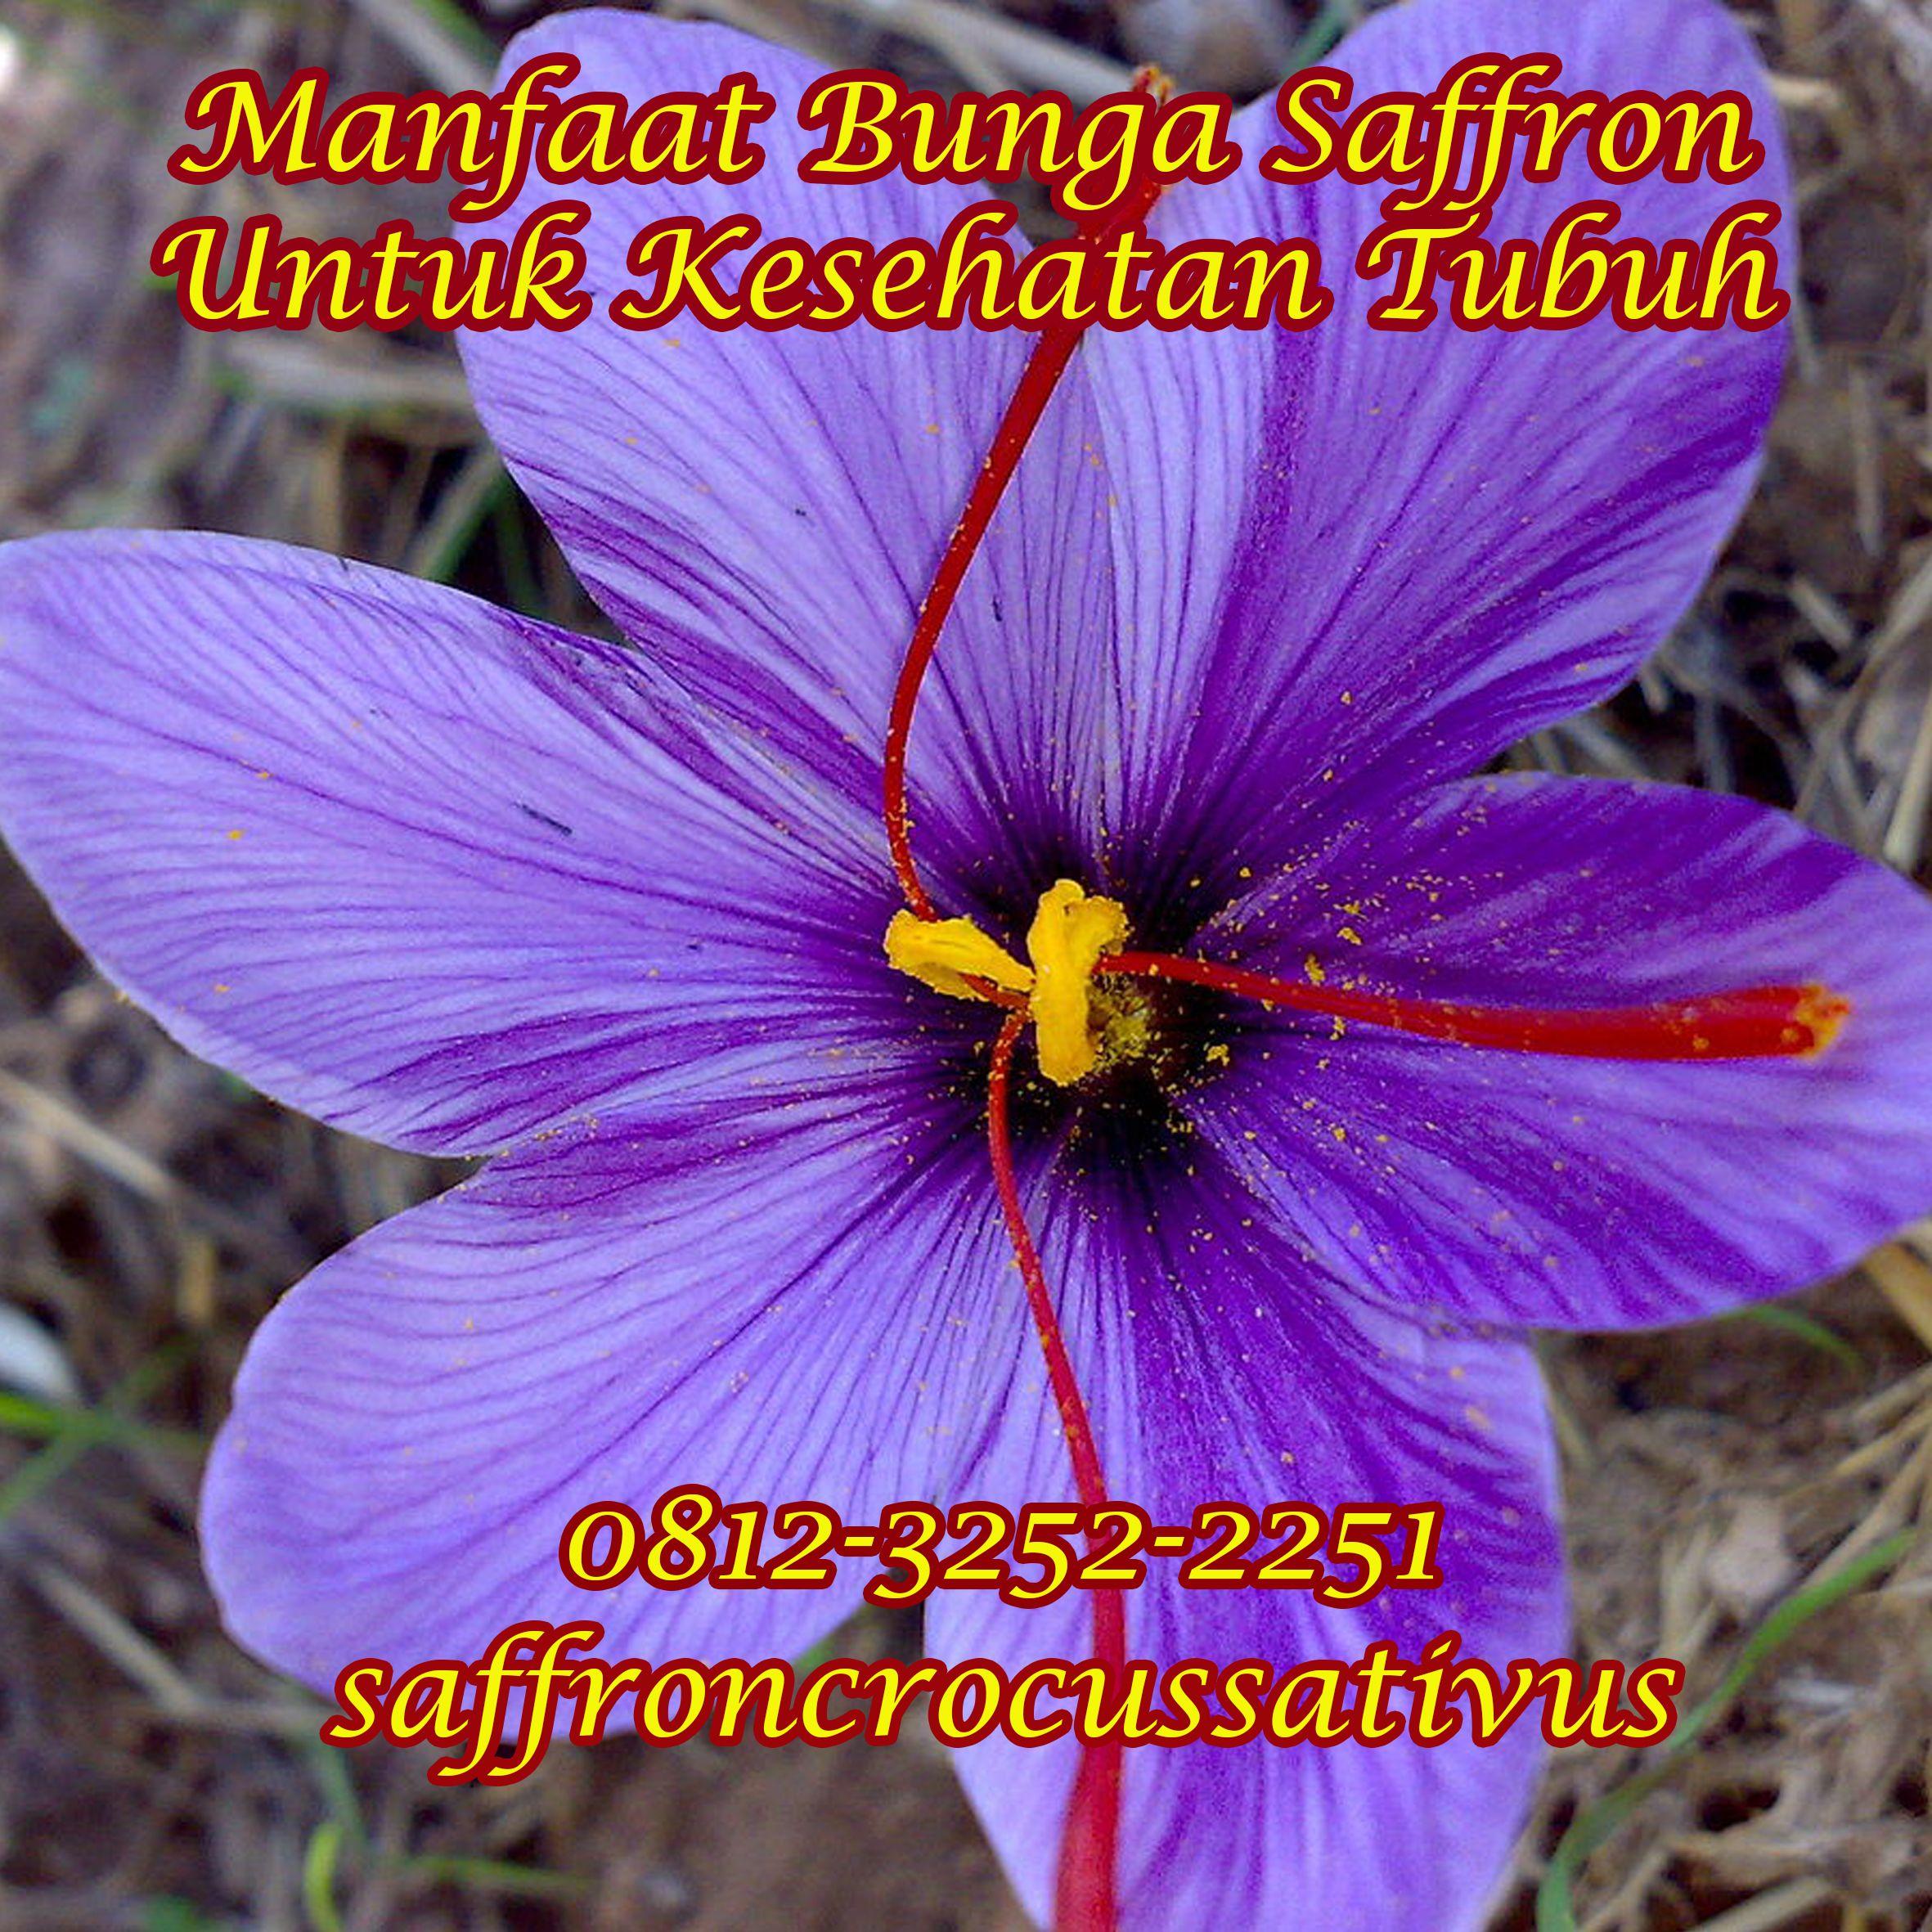 Original Wa 62 812 3252 2251 Tsel Jual Bumbu Masak Saffron Bekasi Tangerang Penjual Bunga Bunga Gambar Bunga